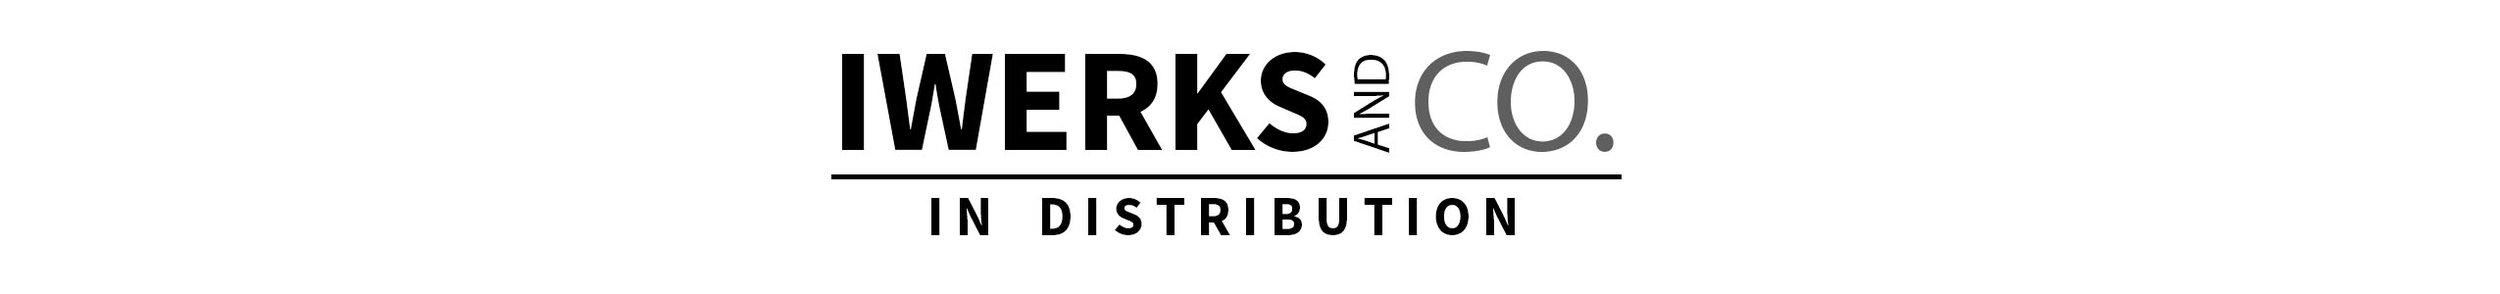 In distribution.jpg